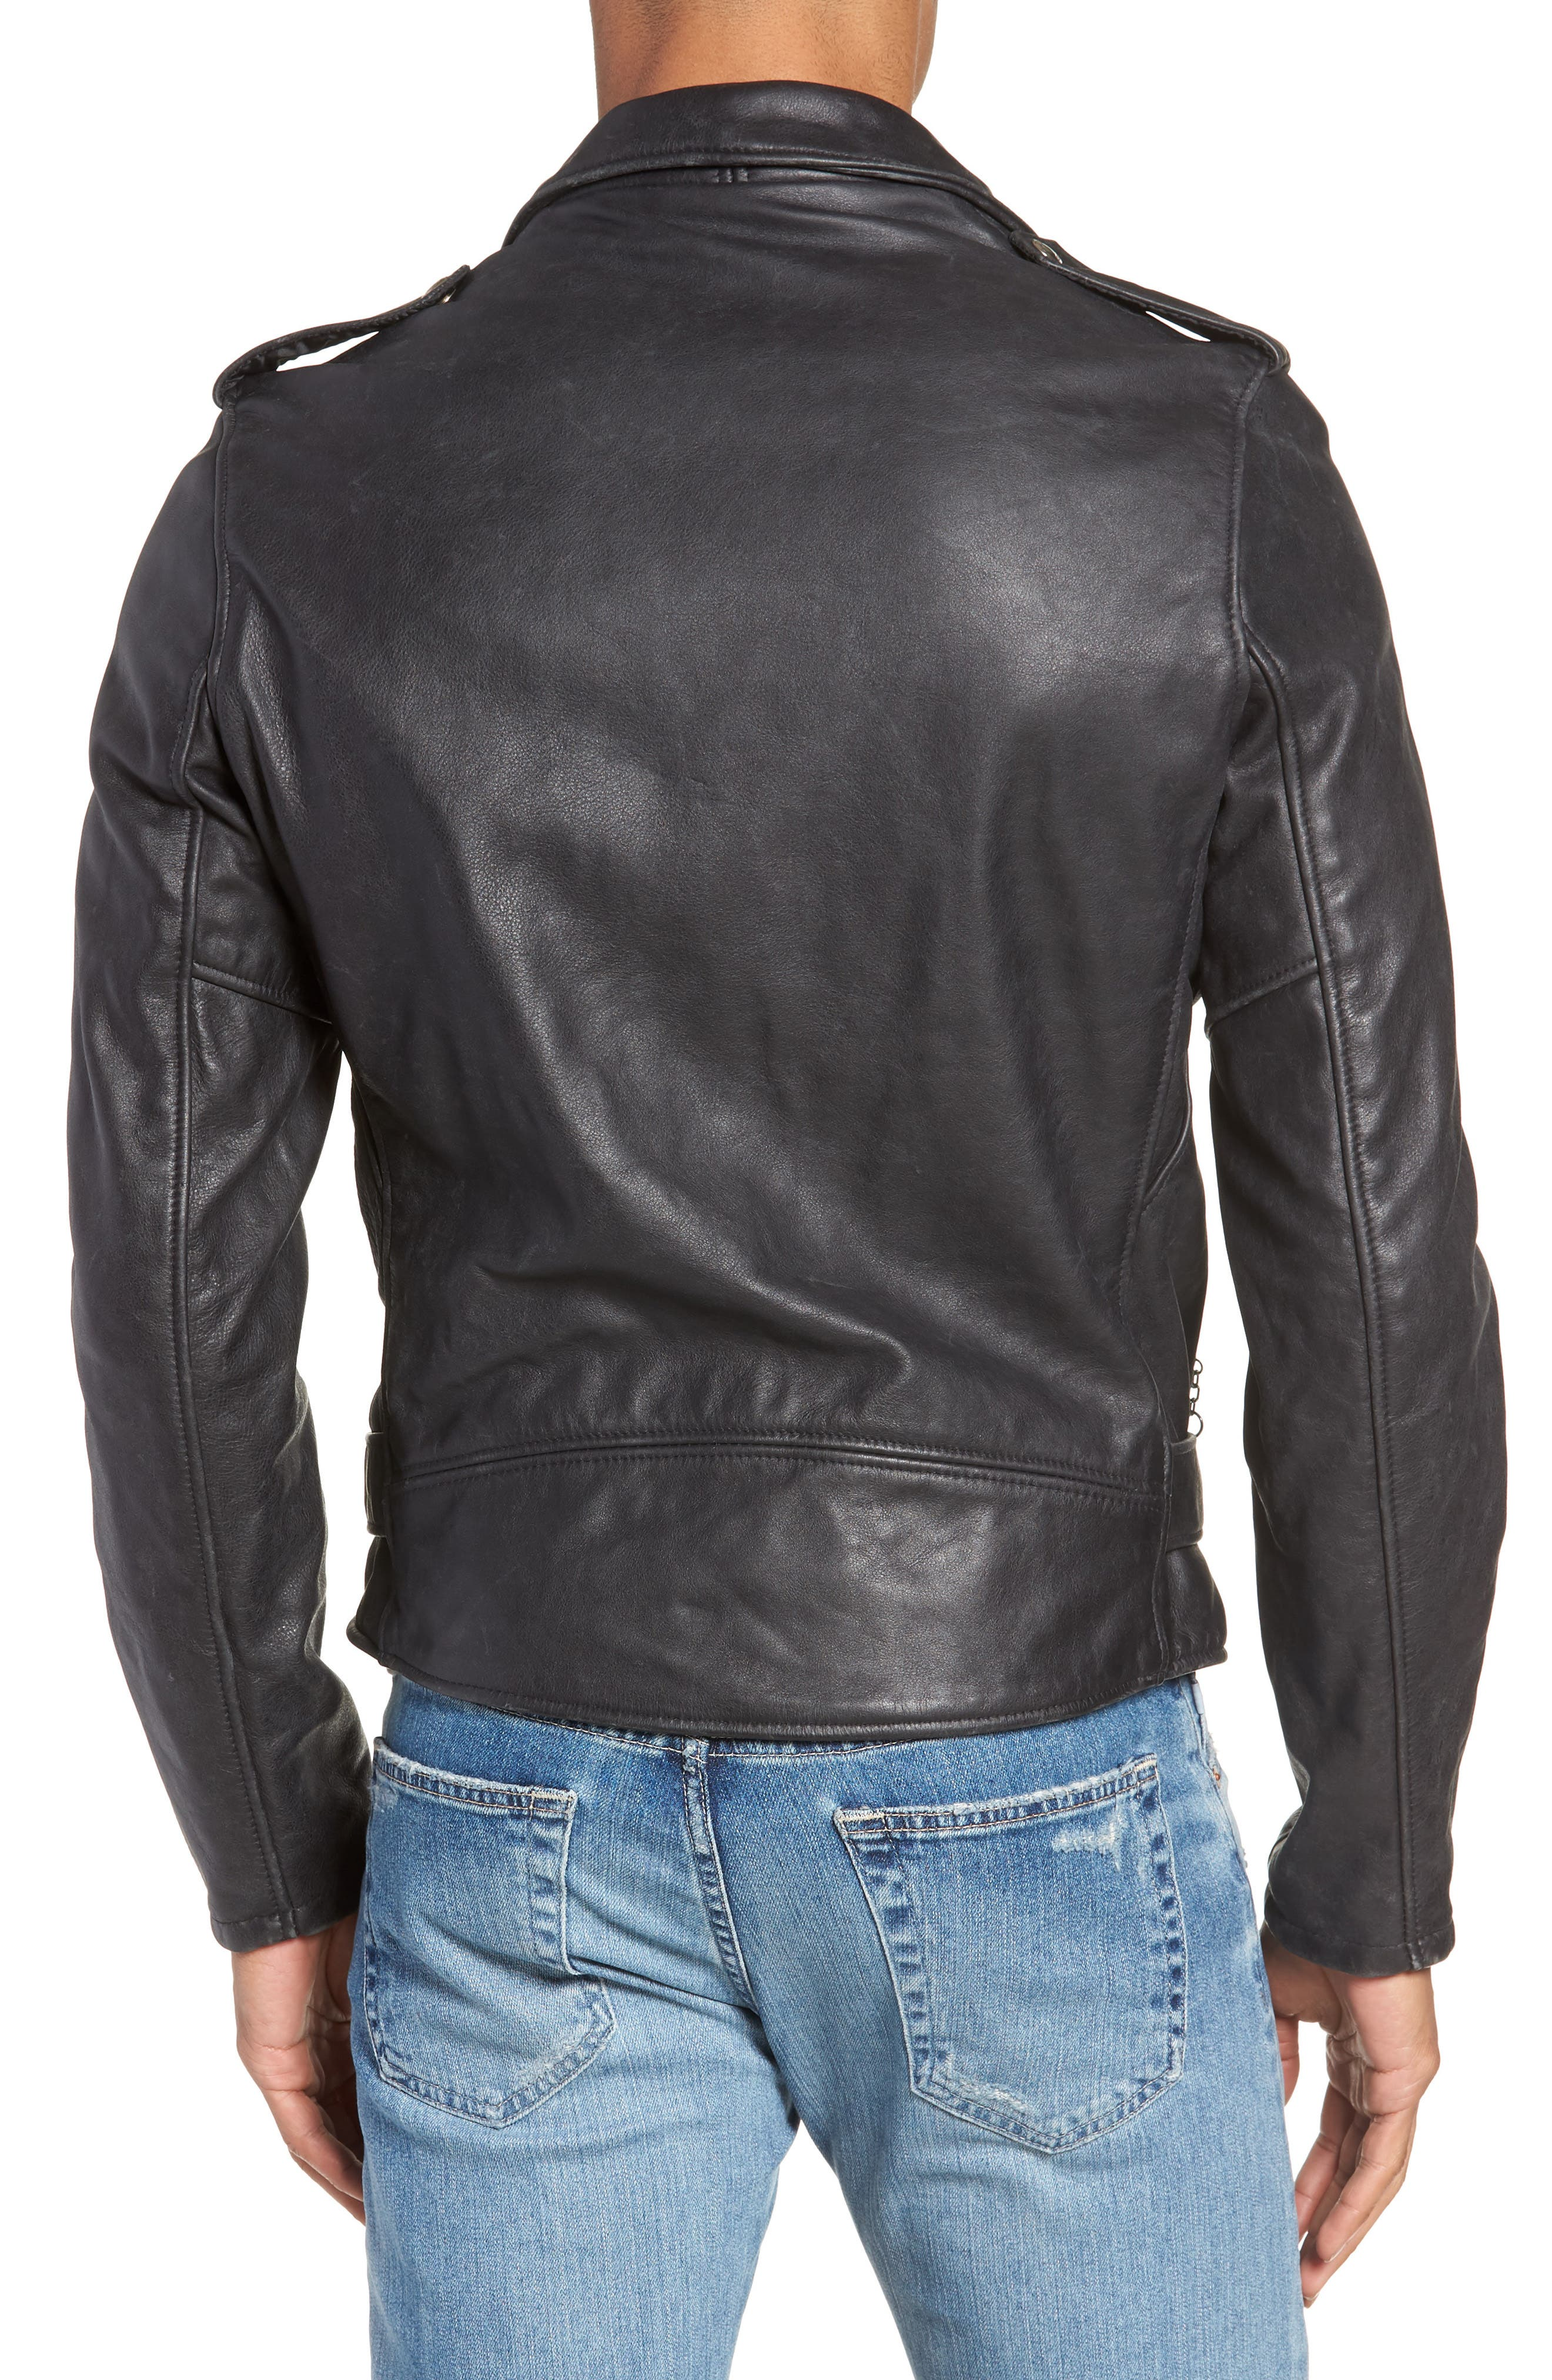 Hand Vintaged Cowhide Leather Motocycle Jacket,                             Alternate thumbnail 2, color,                             BLACK